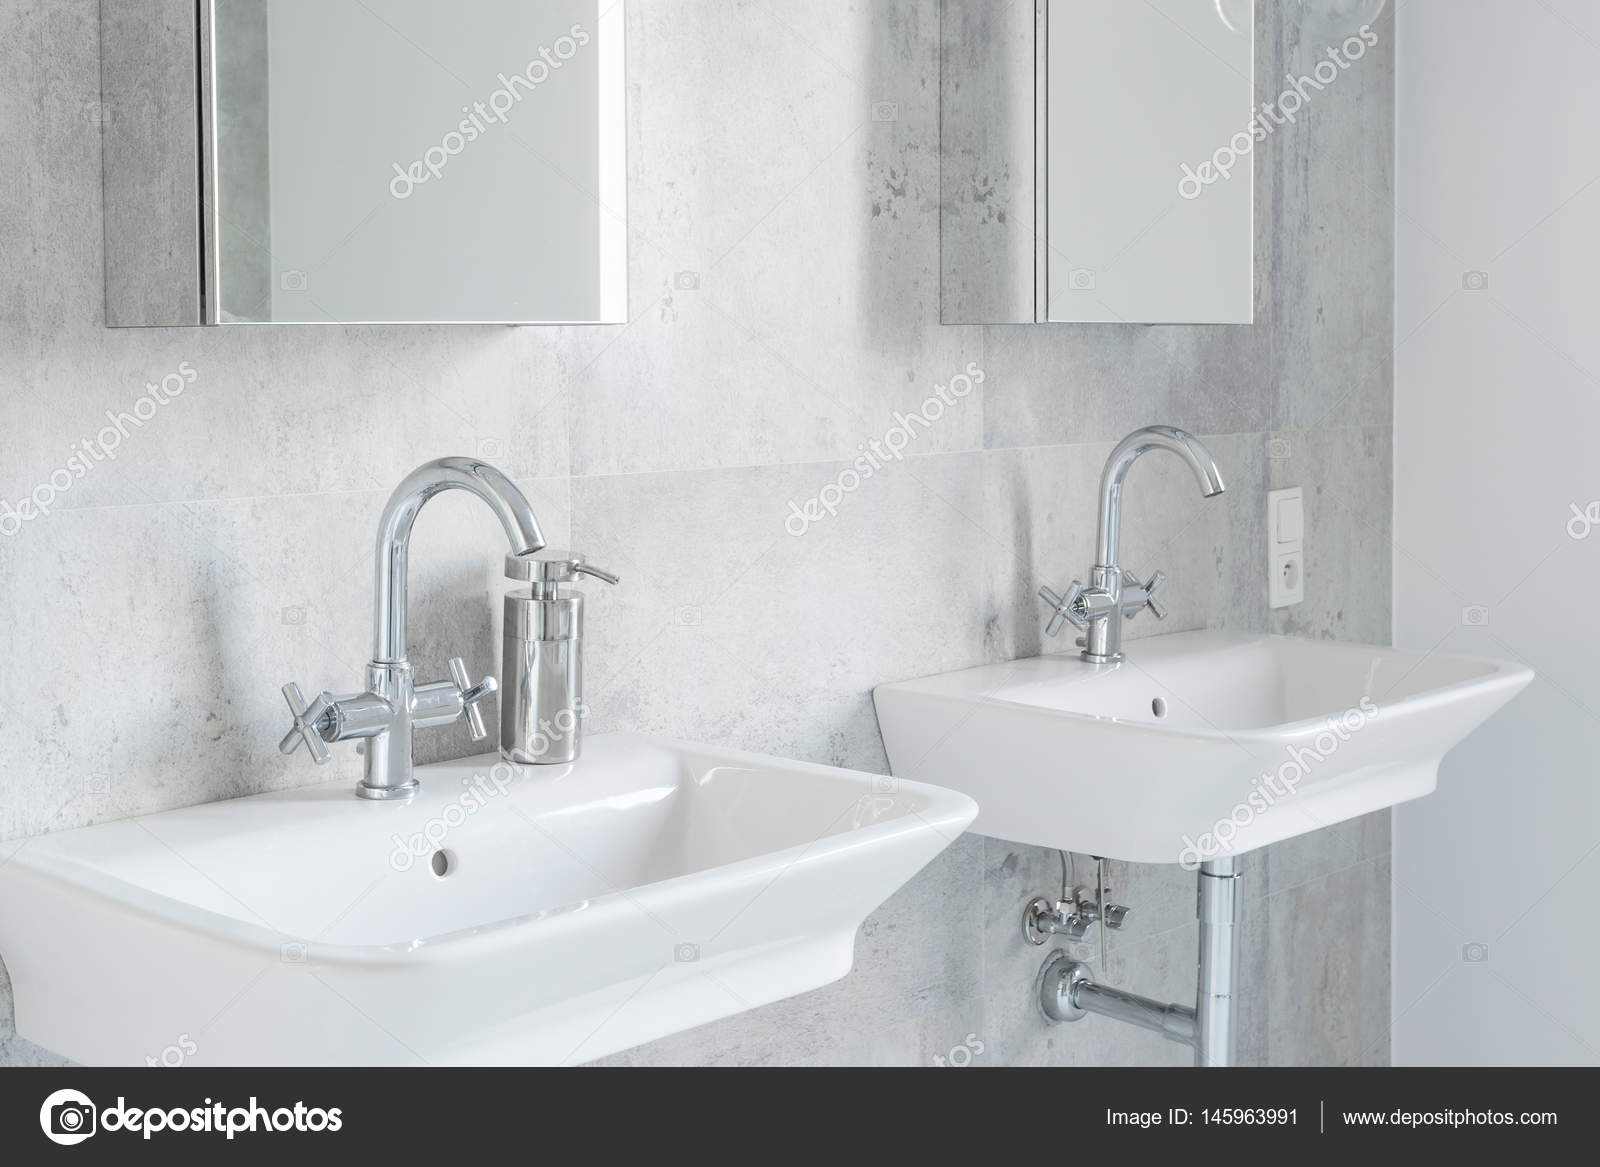 Minimalistische modernistische badkamer met wastafels u stockfoto